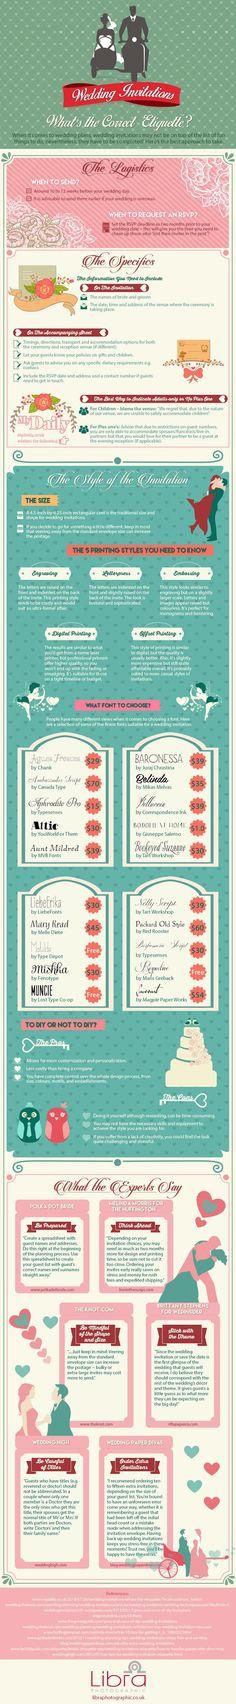 Wedding Invitation Etiquette | Libra Photographic | Bridal Musings Wedding Blog